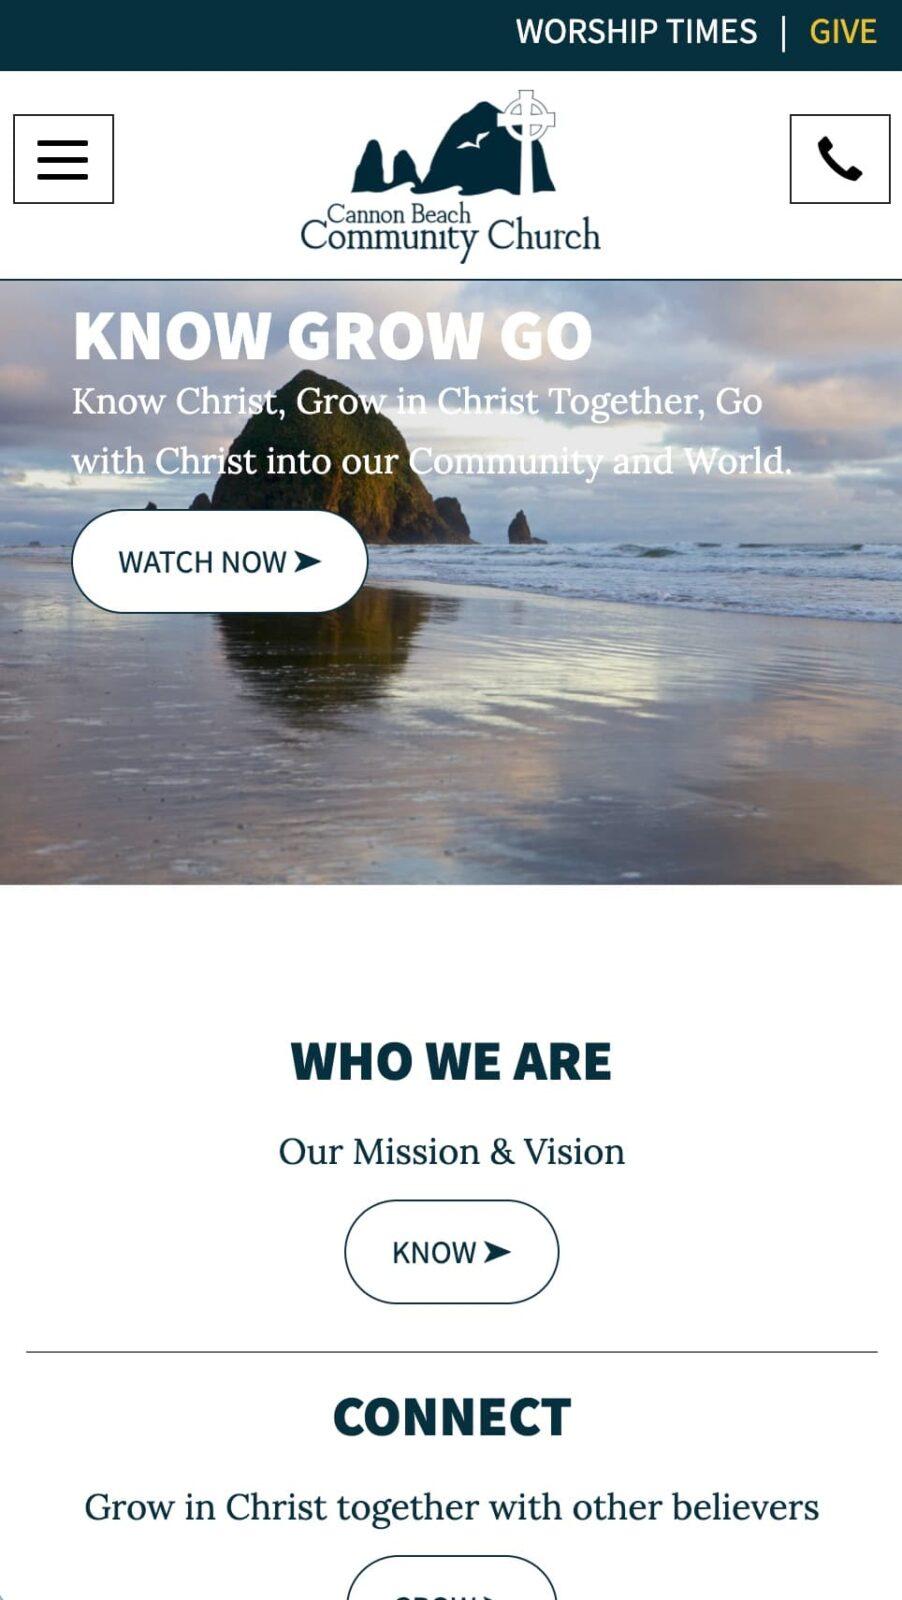 Cannon Beach Community Church mobile site